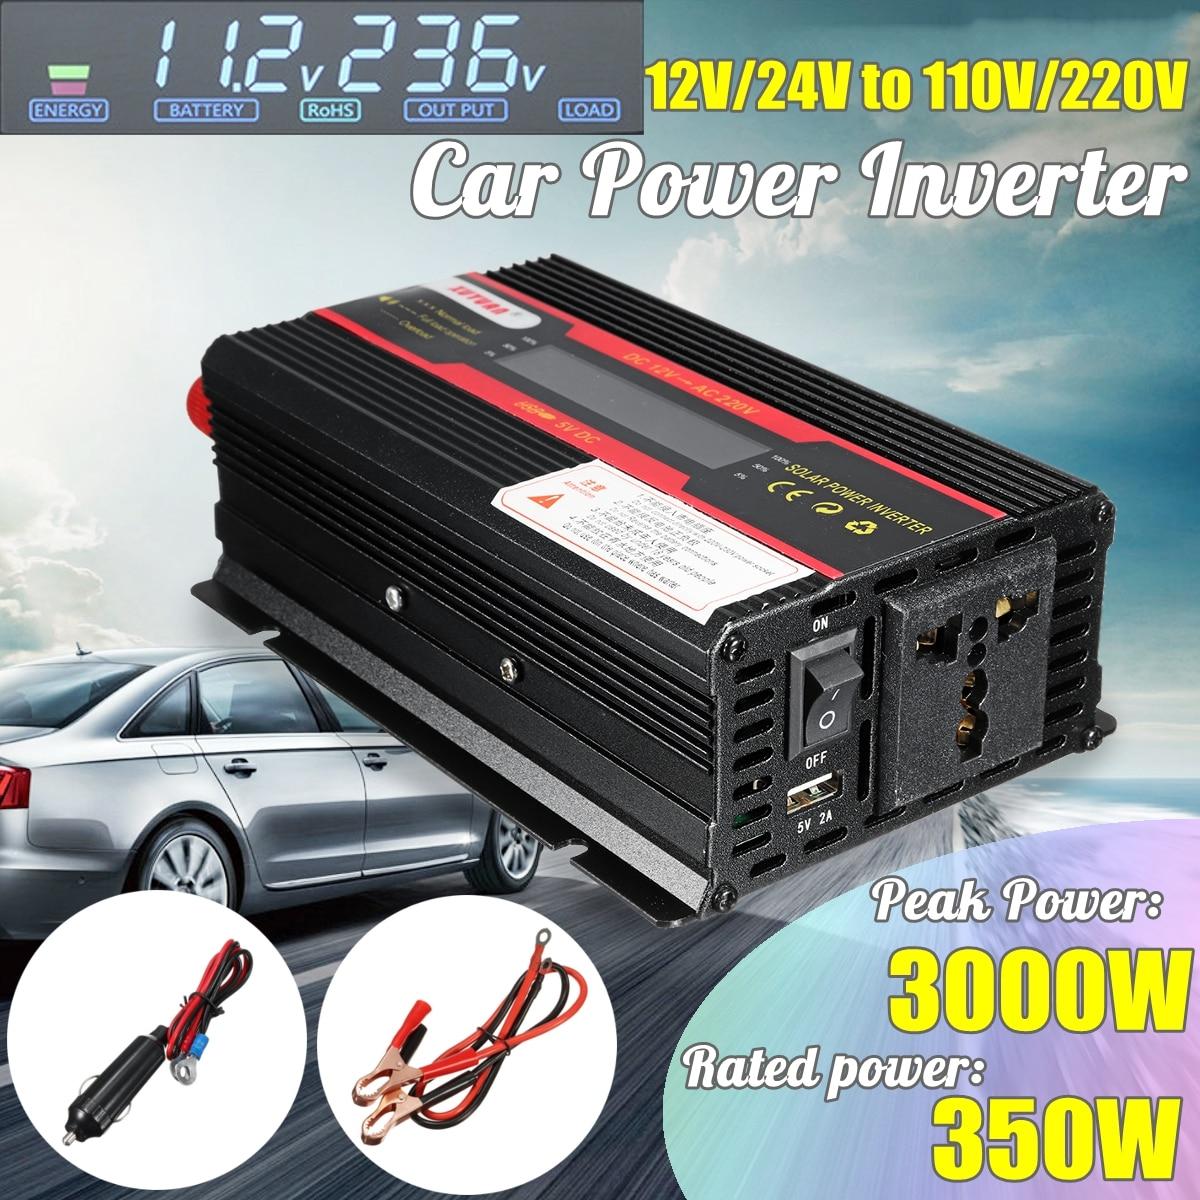 Car Inverter 12V 220V 3000W P eak Power Inverter Voltage Convertor Transformer DC 12V/24V To AC 220V/110V Solar Inversor LCD 1pcs lot sh b17 50w 220v to 110v 110v to 220v